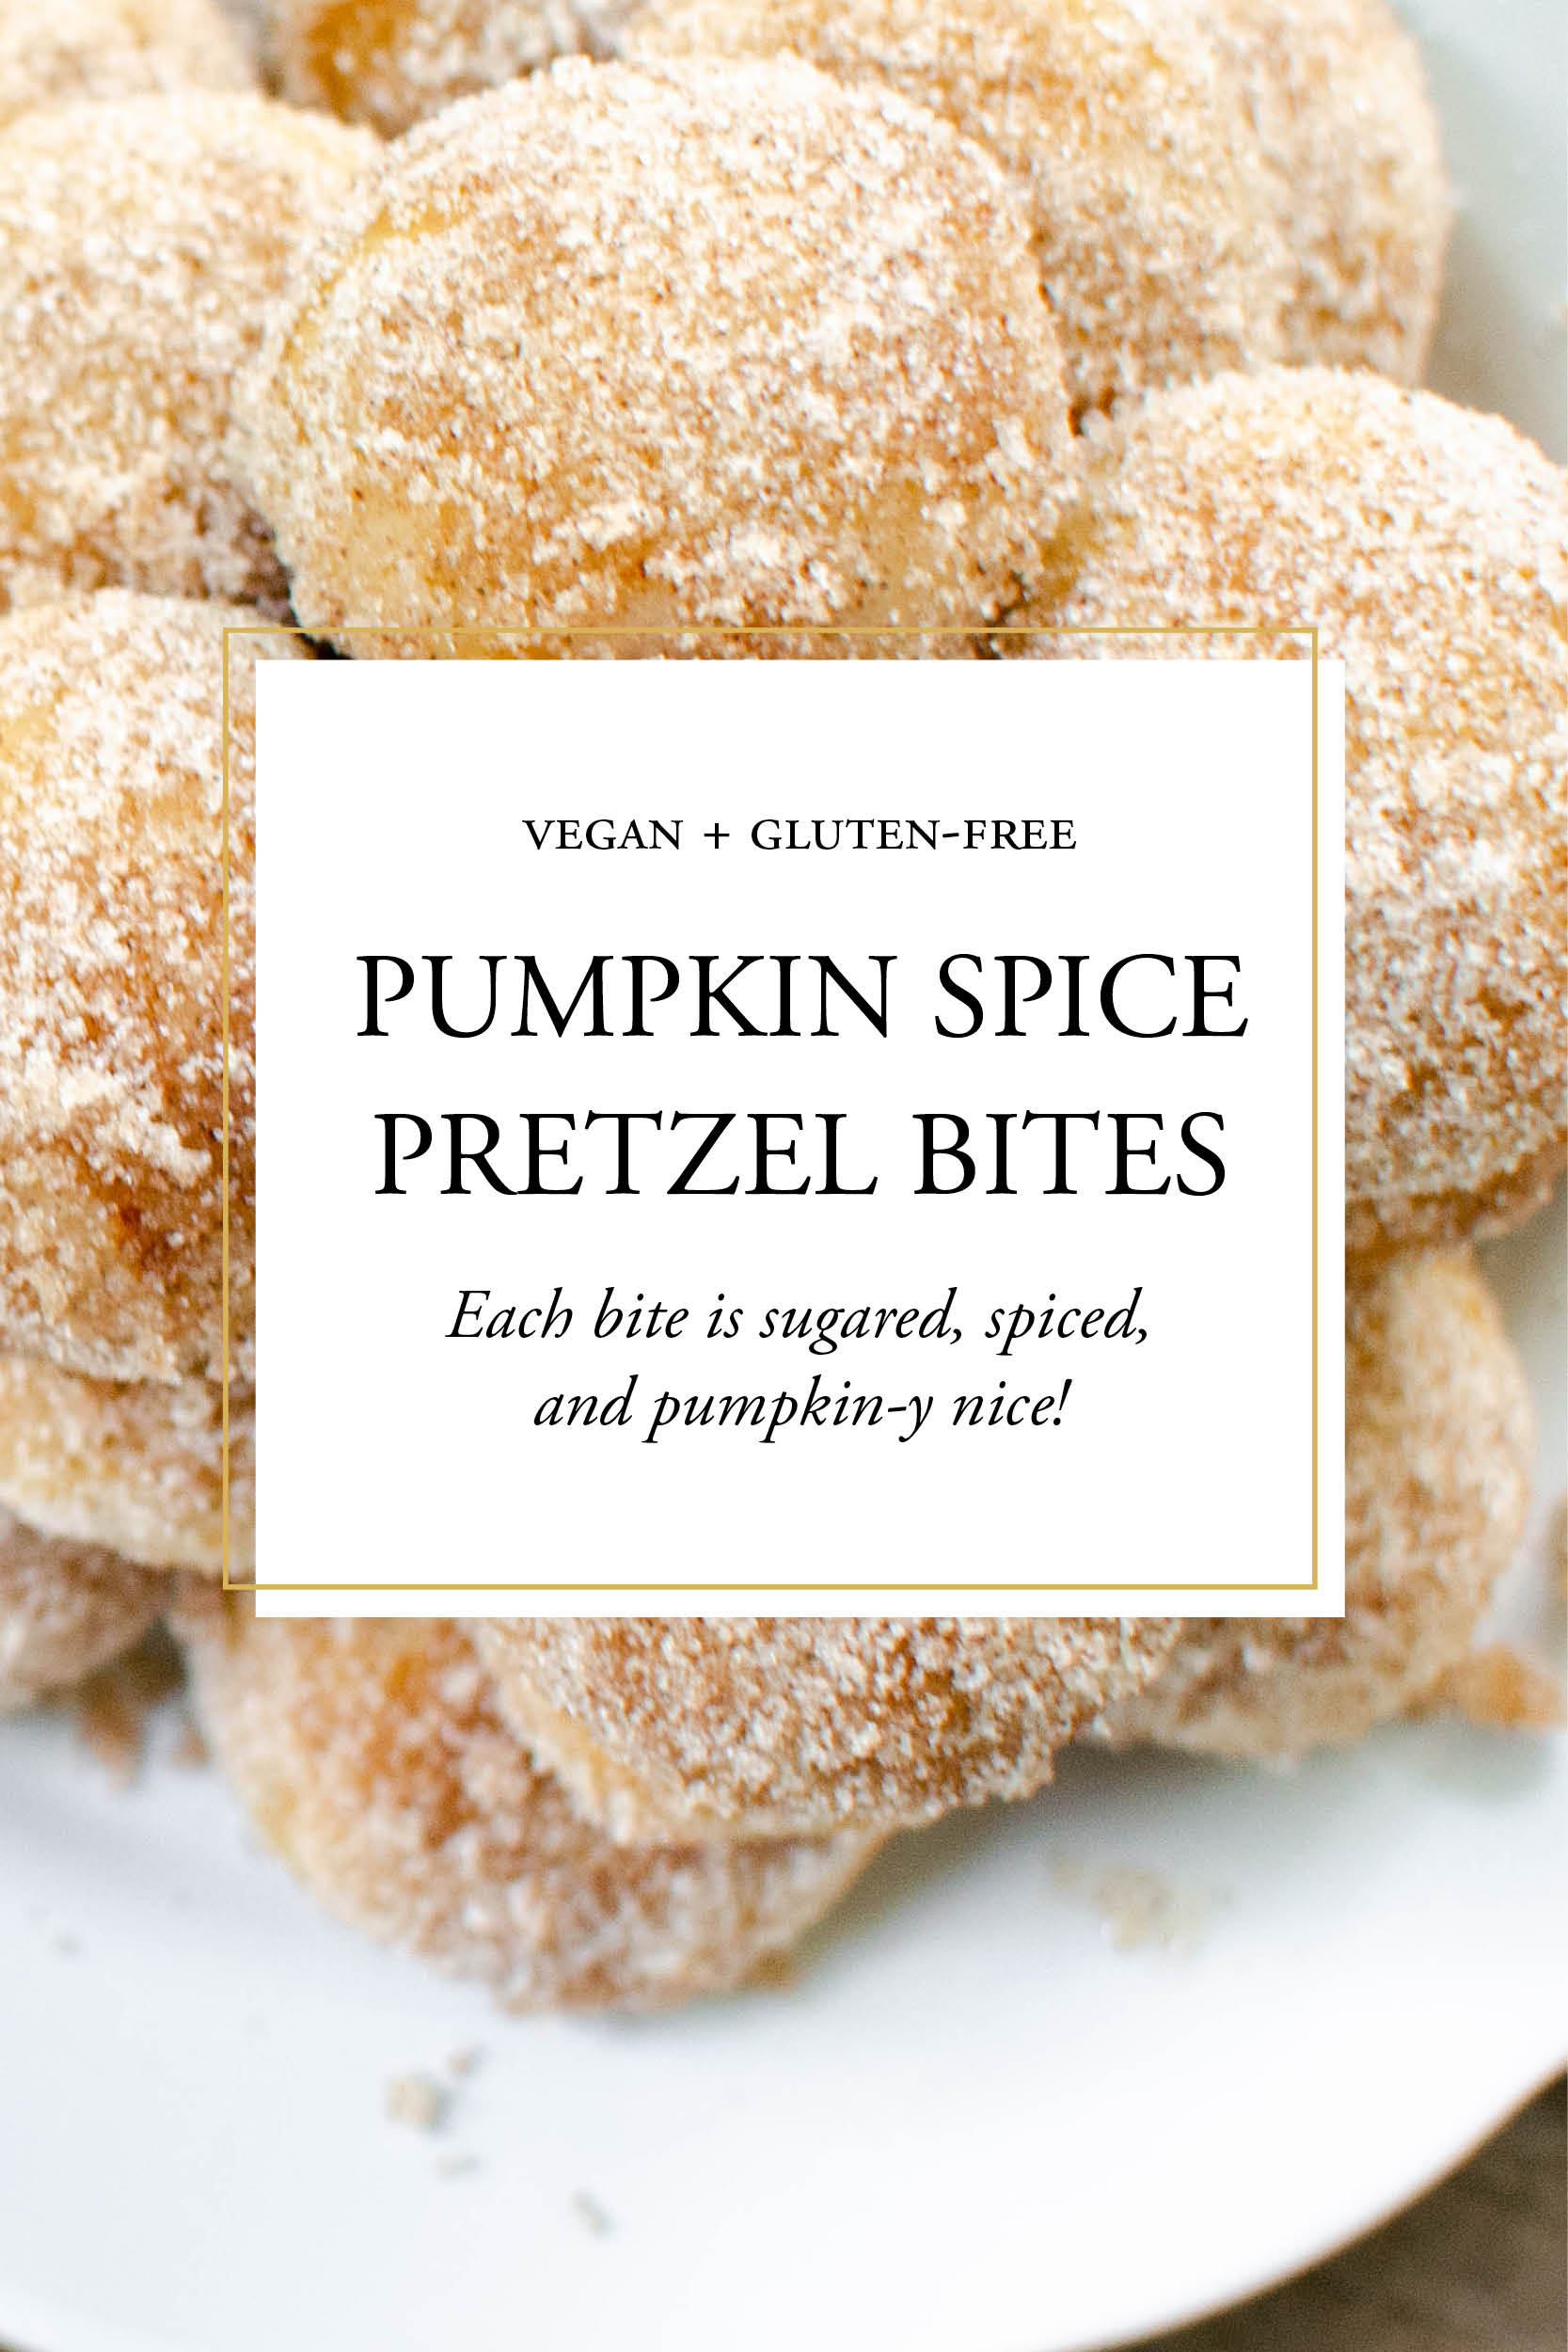 Studioist_Pinterest Design_Pumpkin Spice Pretzel Bites.jpg